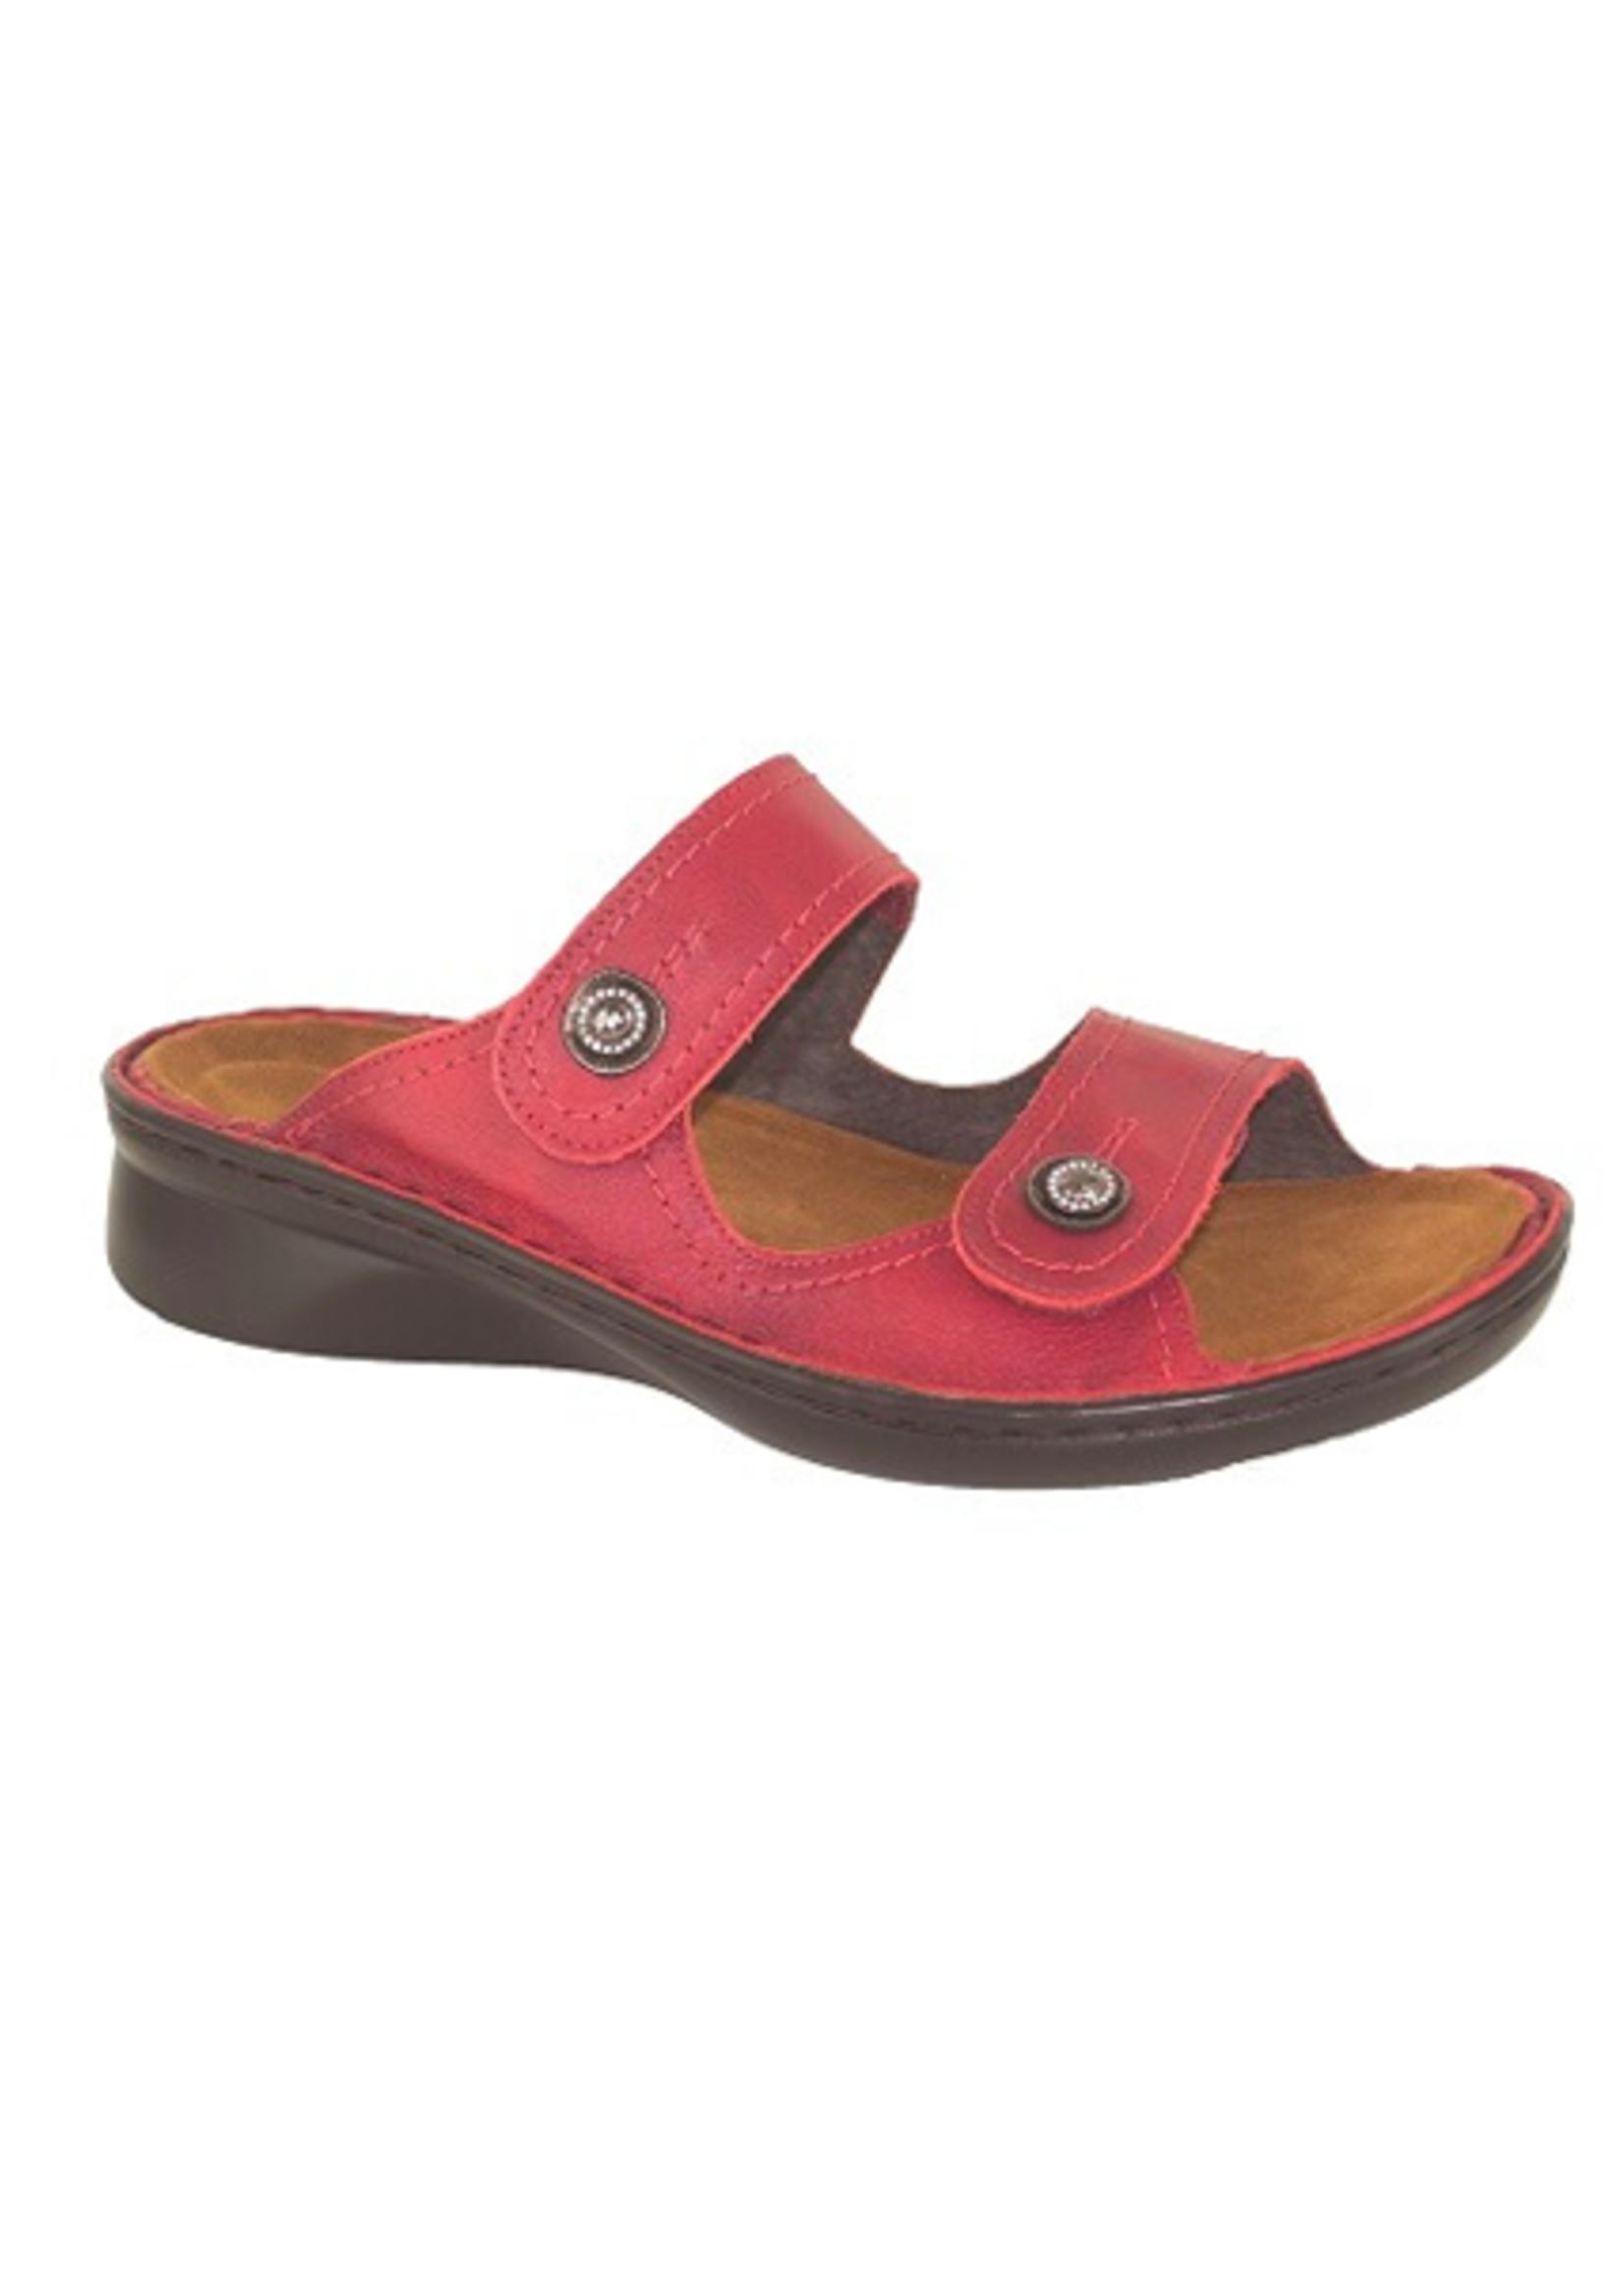 Naot Footwear Sitar in Berry Red